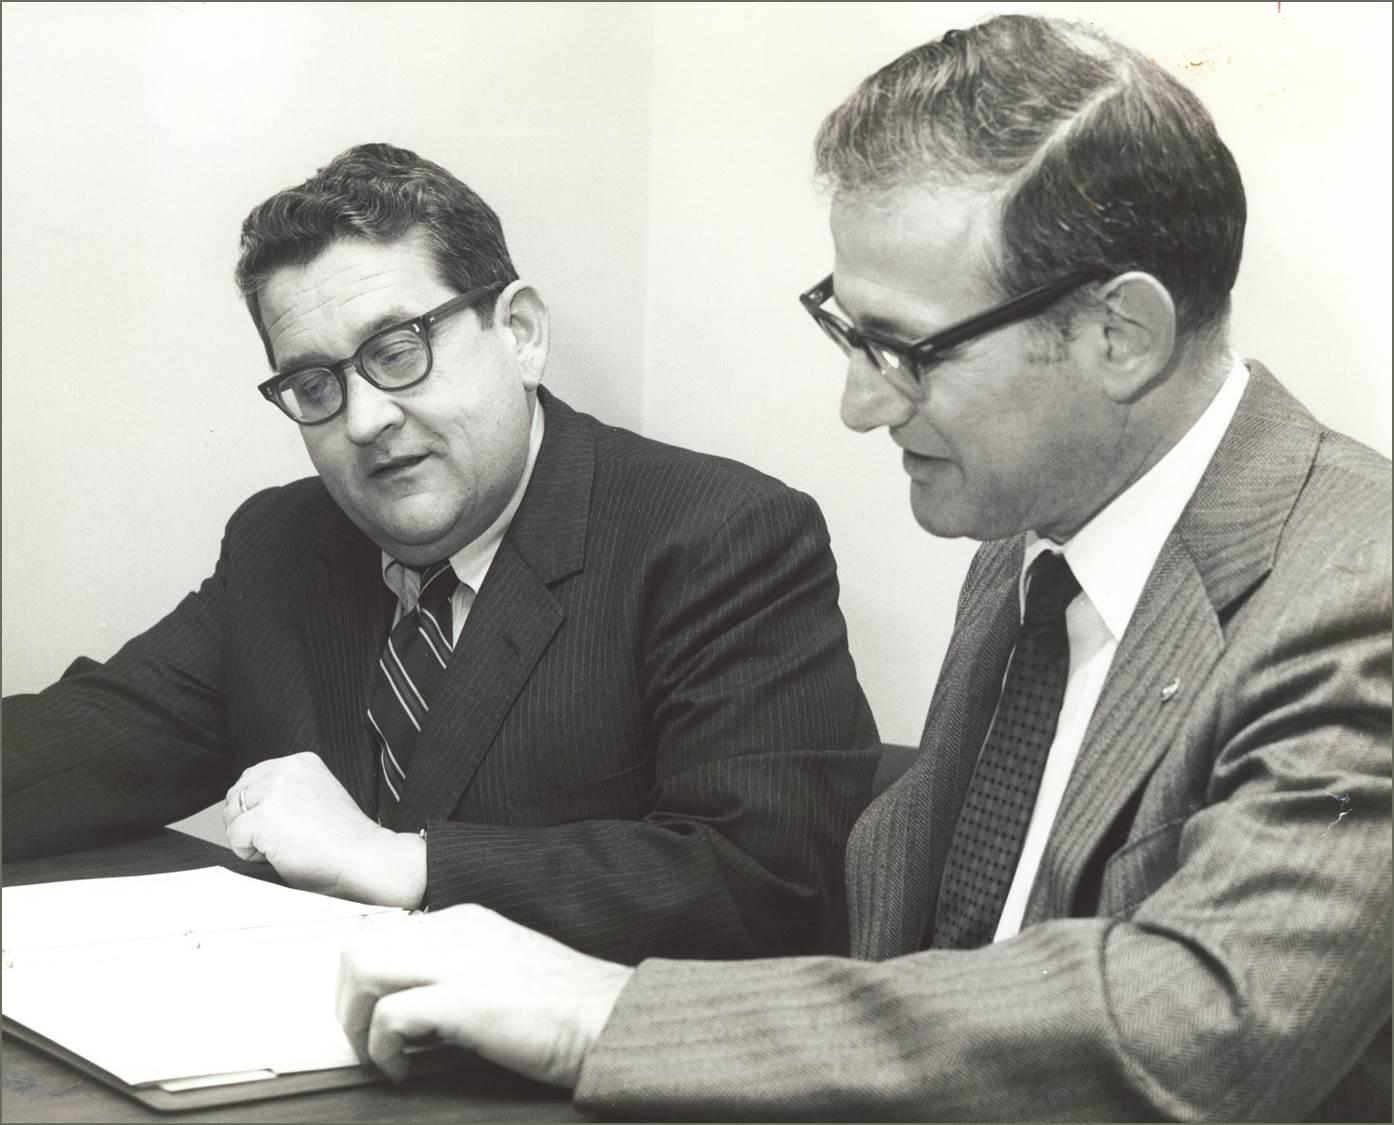 1969 | Stevens and McCoy